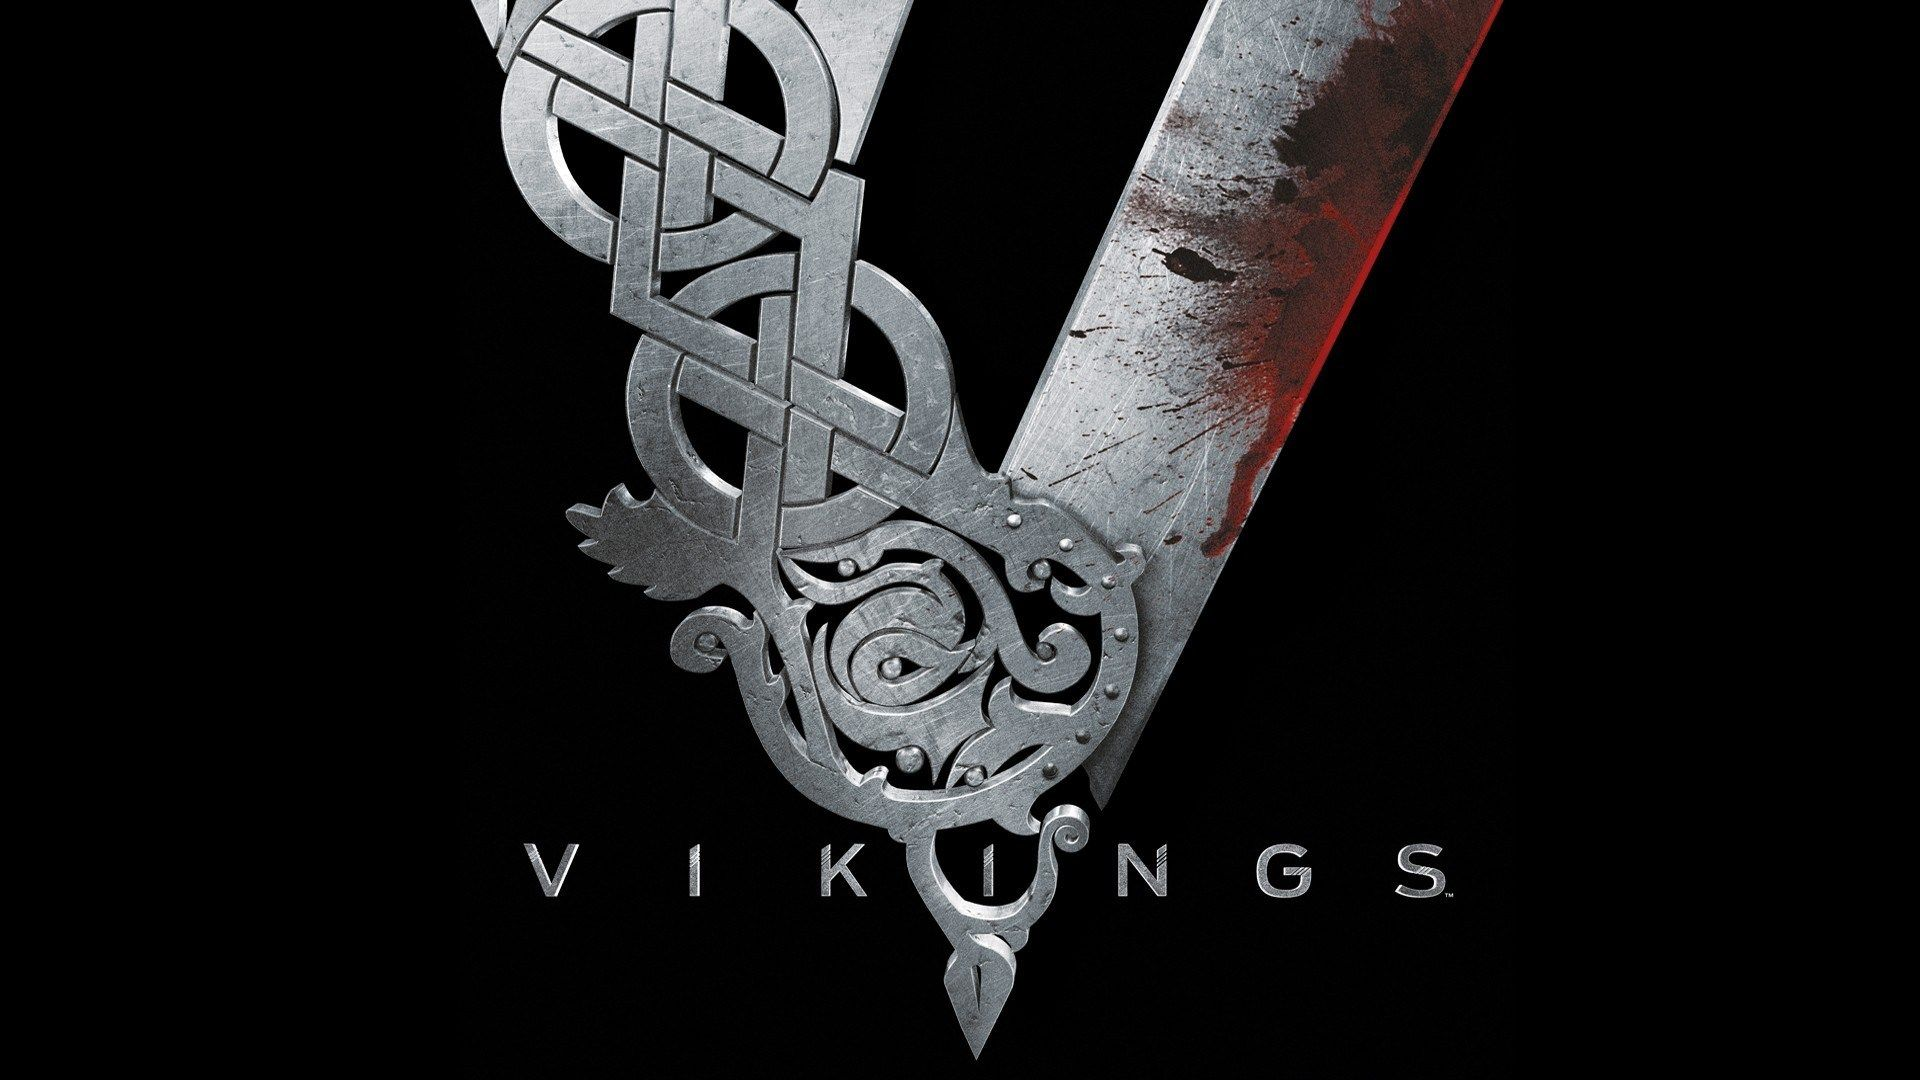 Vikings Theme Background Images Vikings Category Desktop